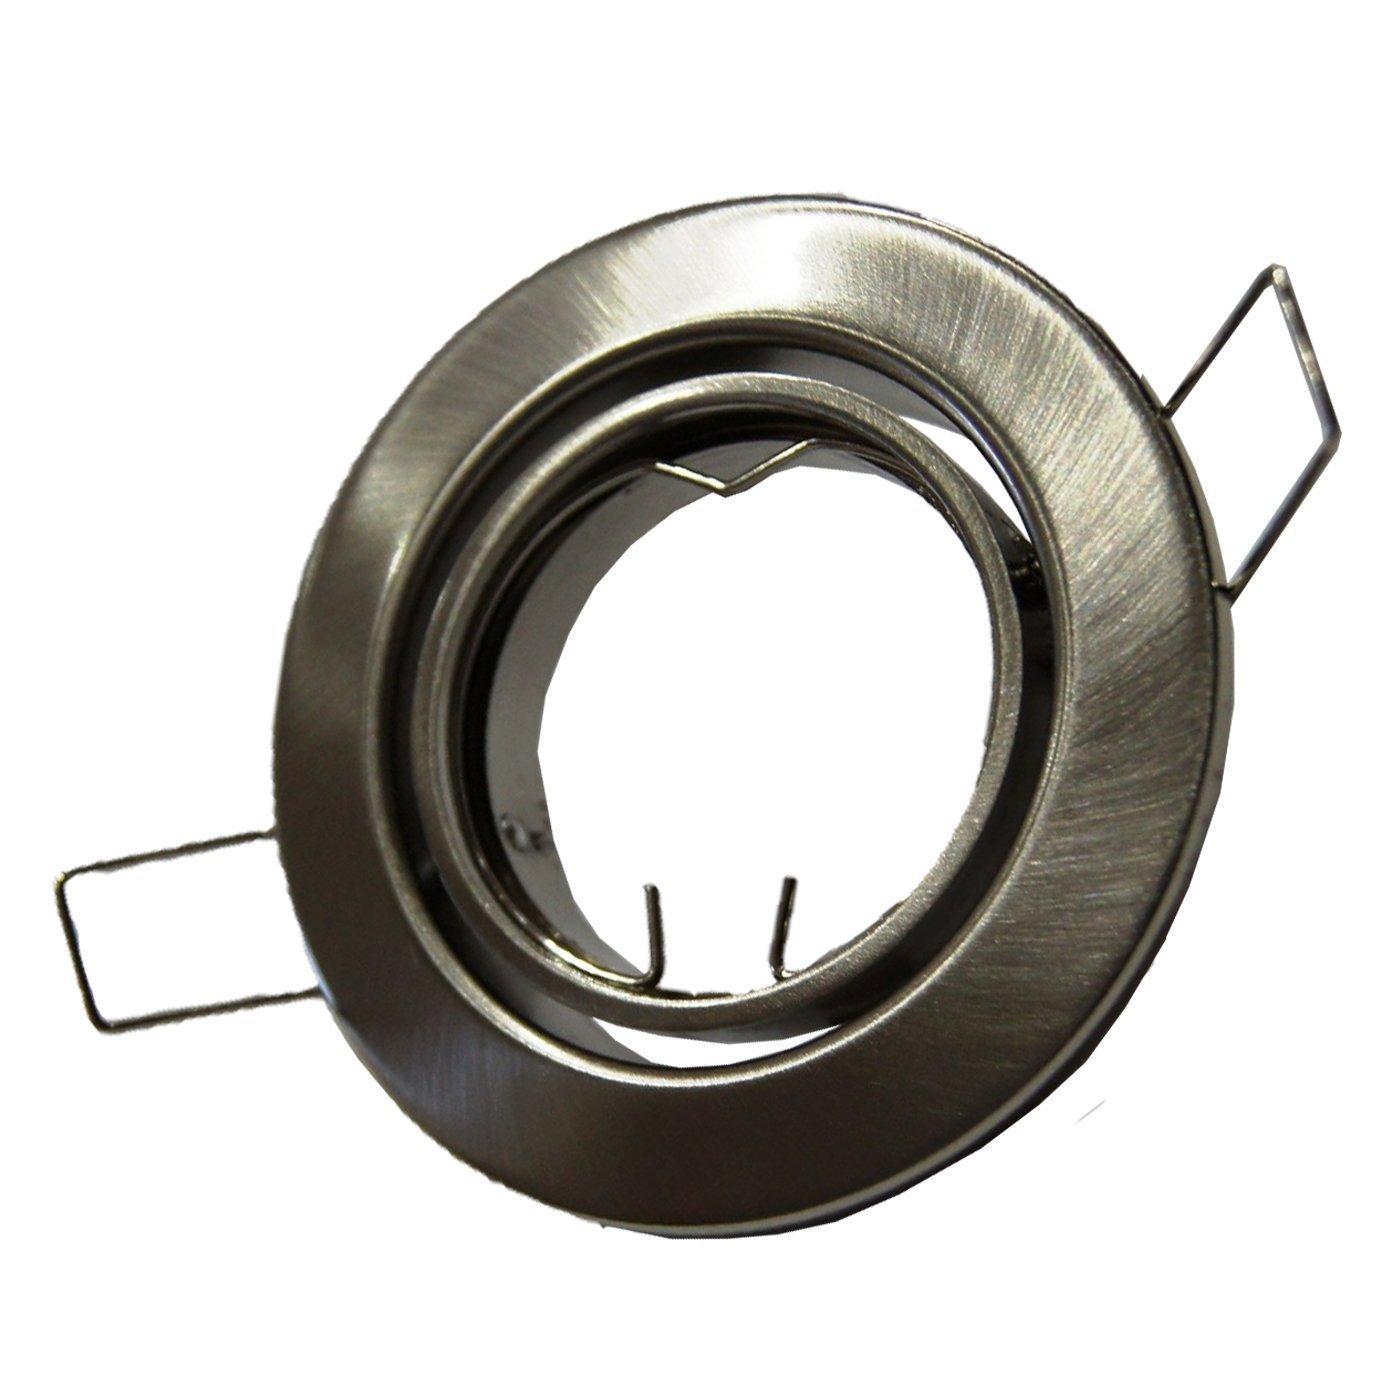 50x E4405-5 Metall Einbaustrahler Einbauspot in Eisengebürstet matt ideal für LED